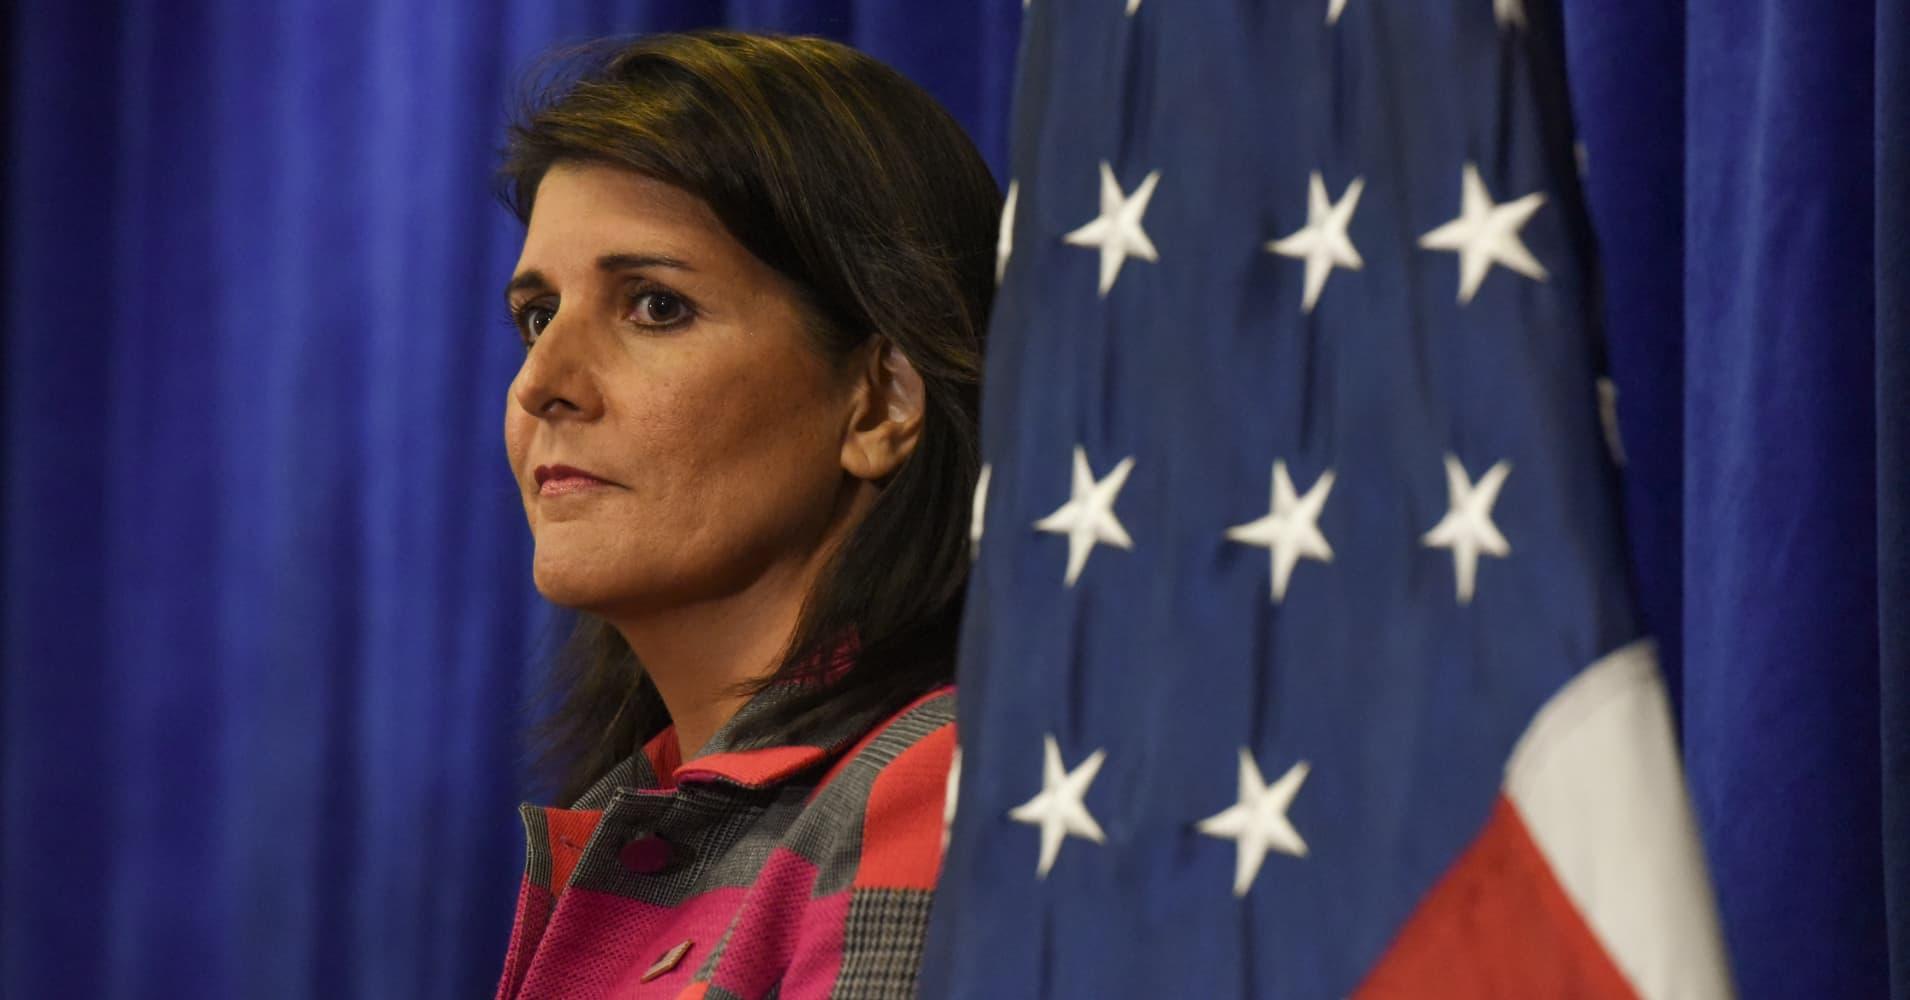 Nikki Haley resigns as Trump's UN ambassador: Source